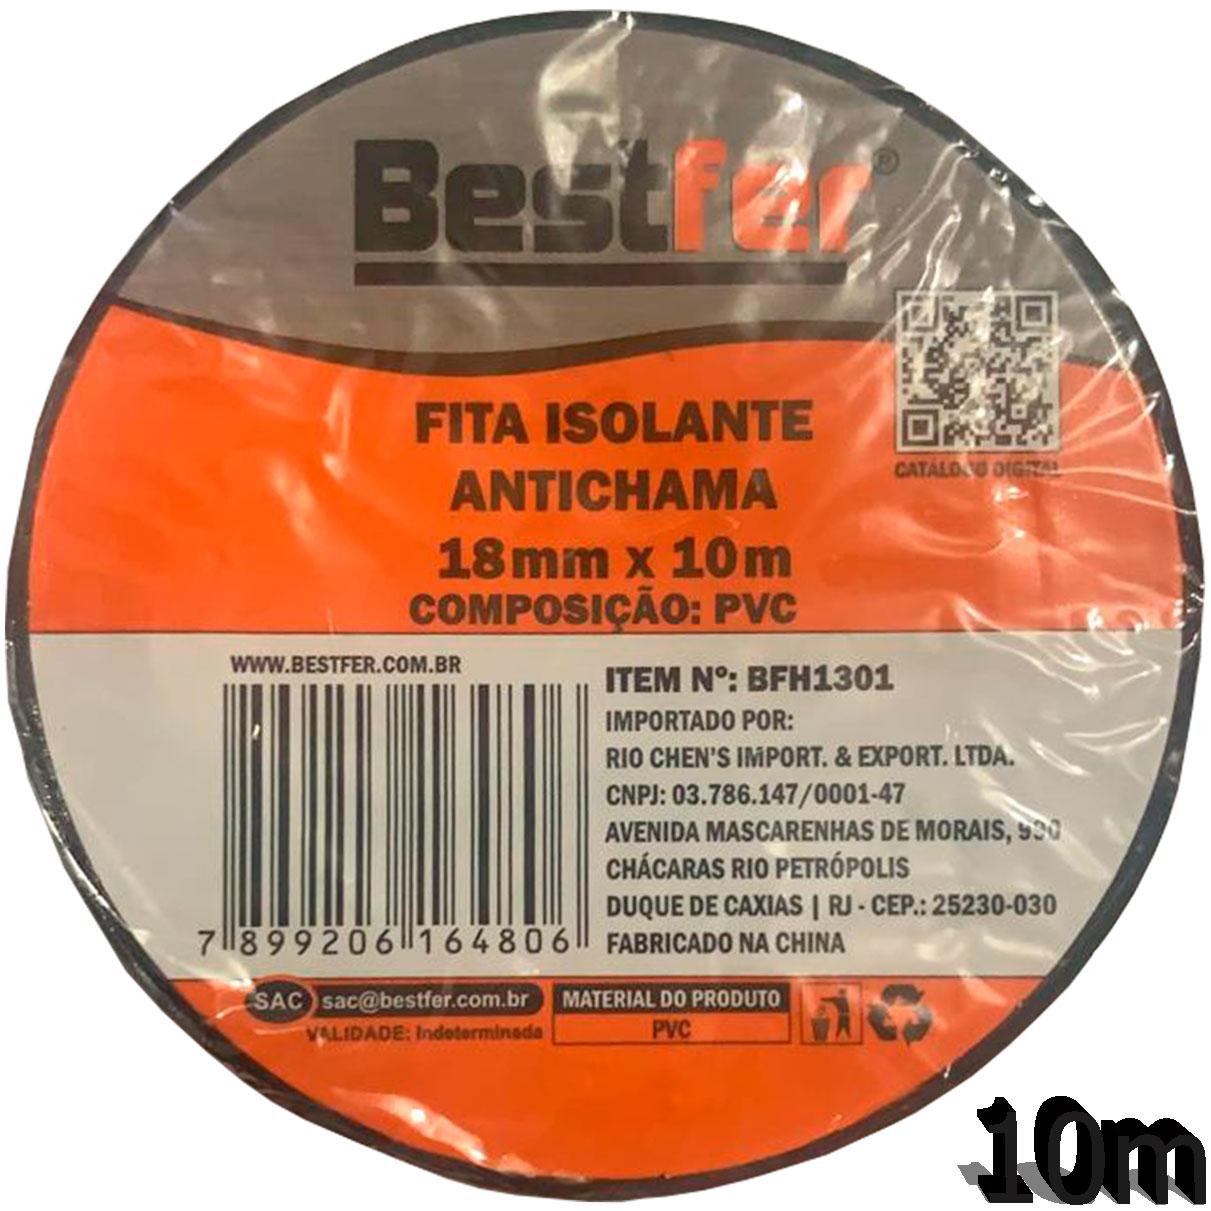 Fita Isolante Antichama 18mm x 10m PVC BFH1301 - Bestfer